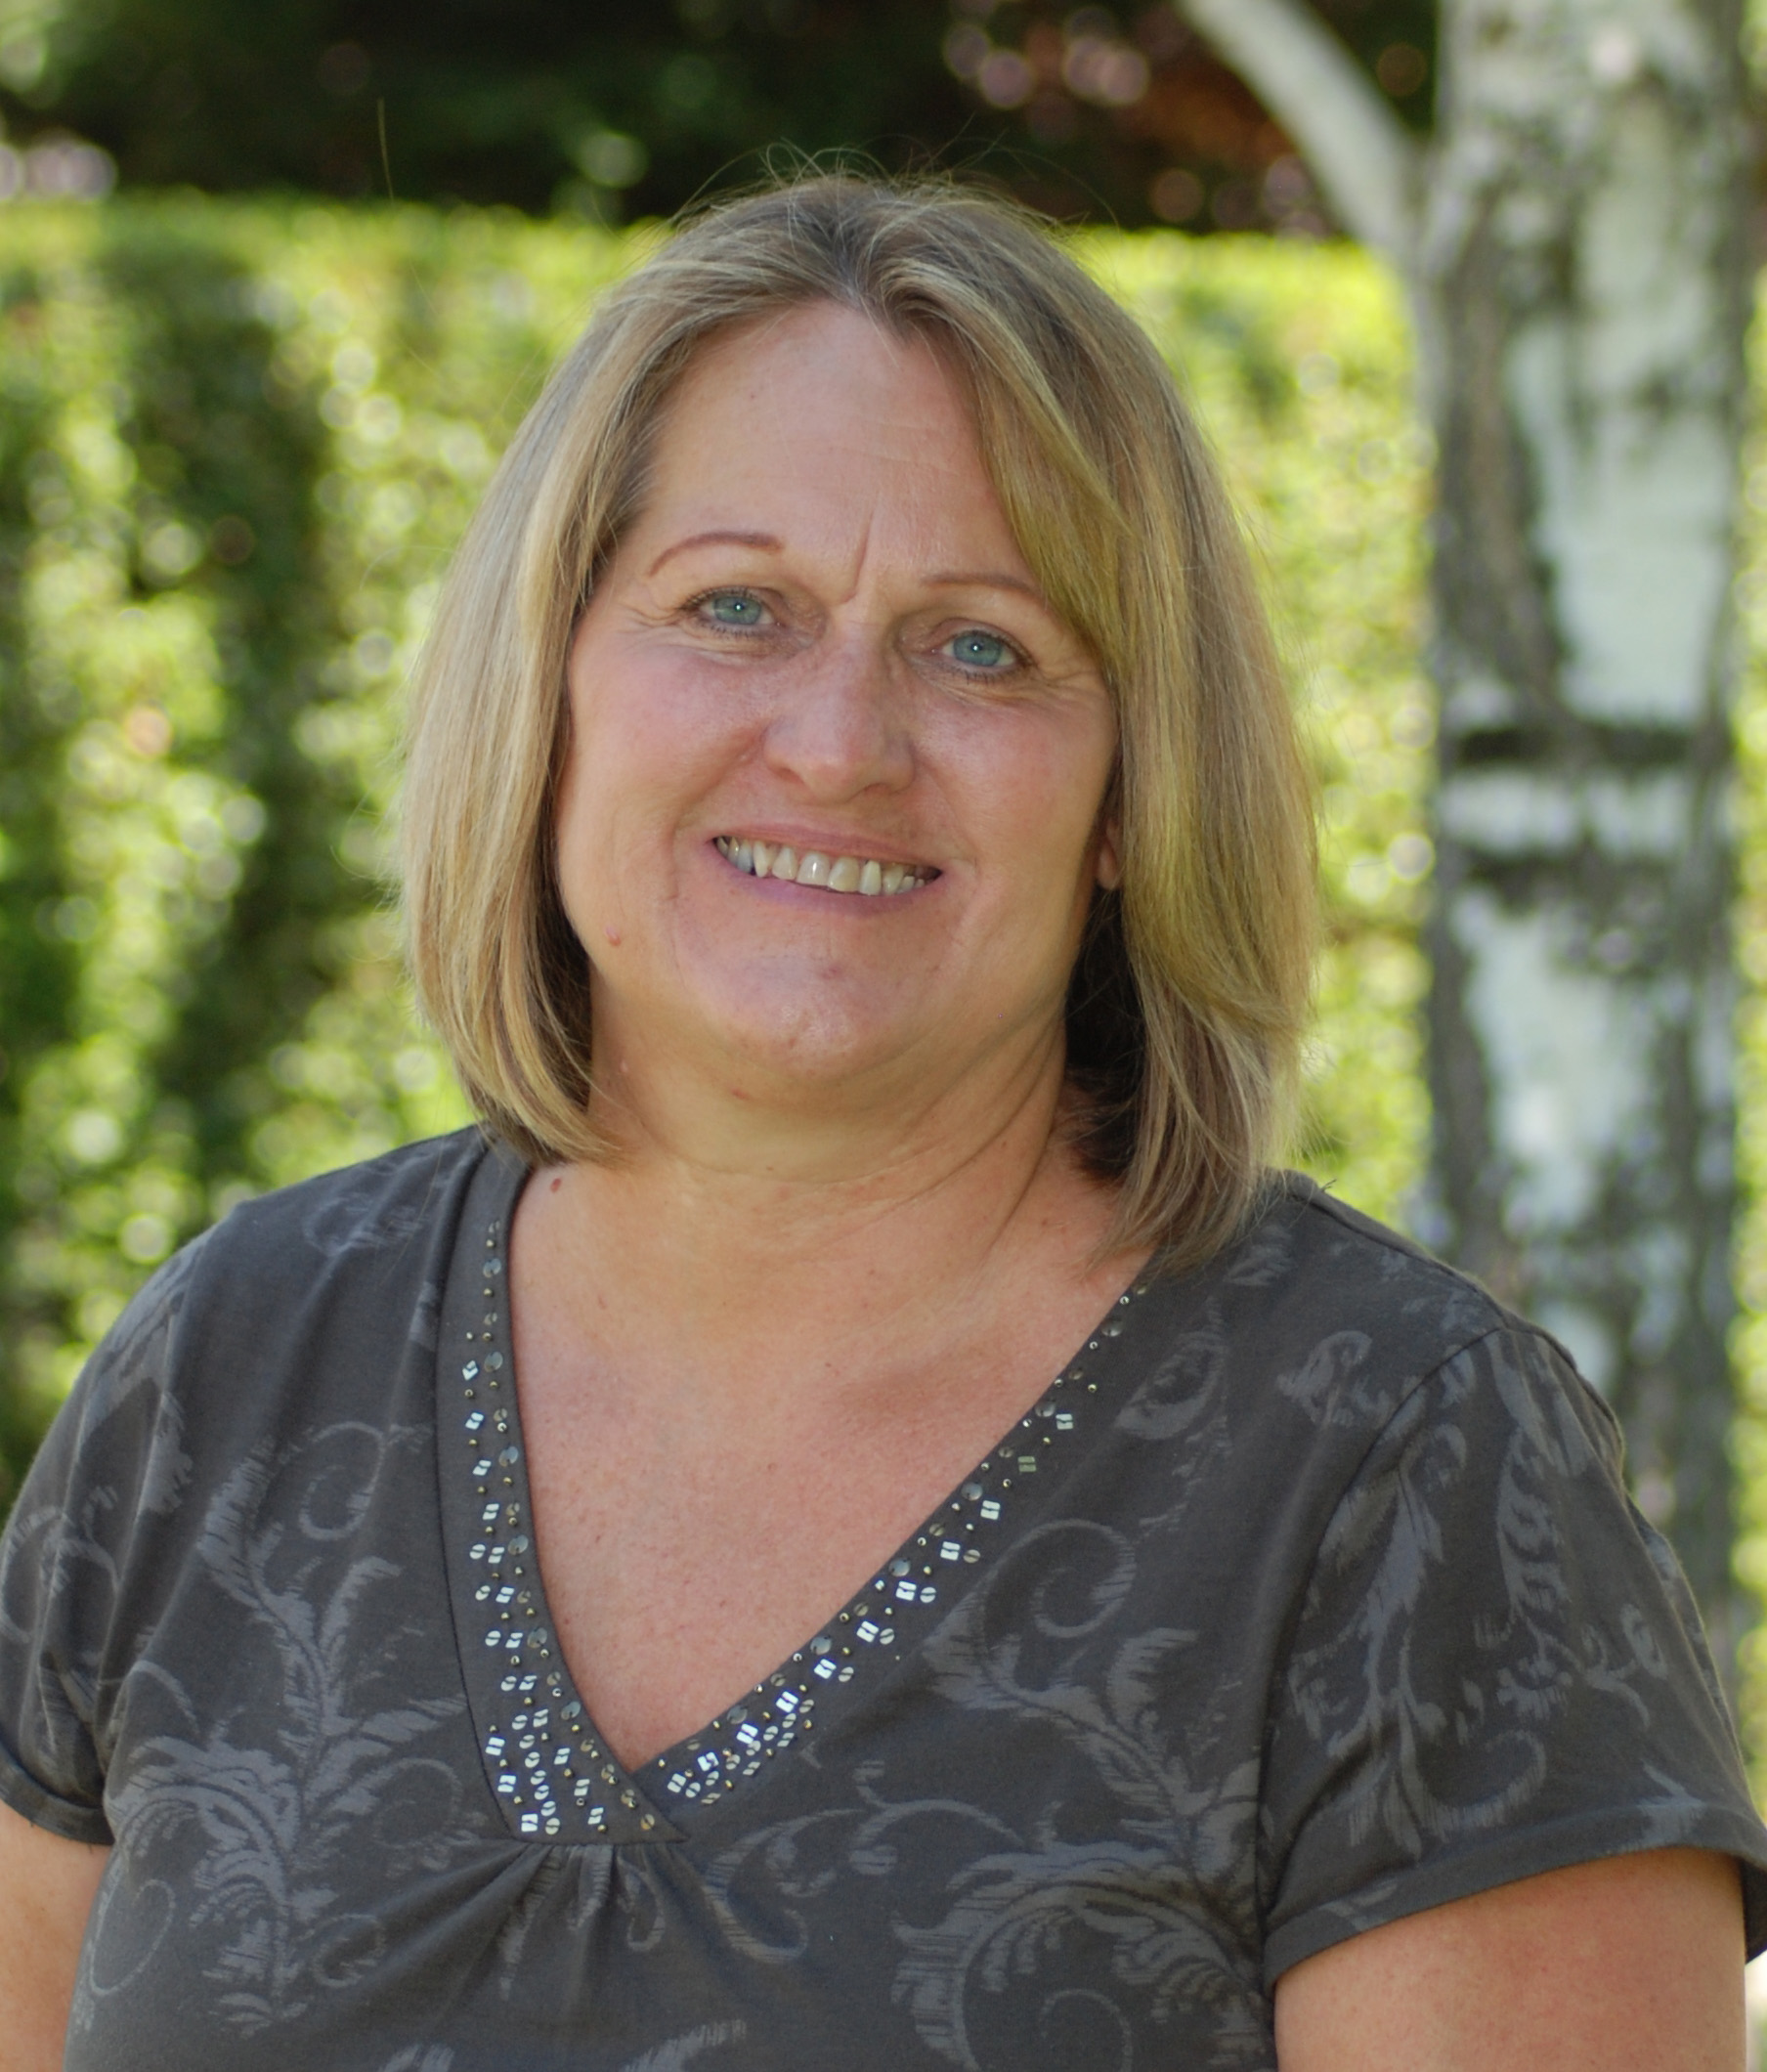 Debbie Kenney